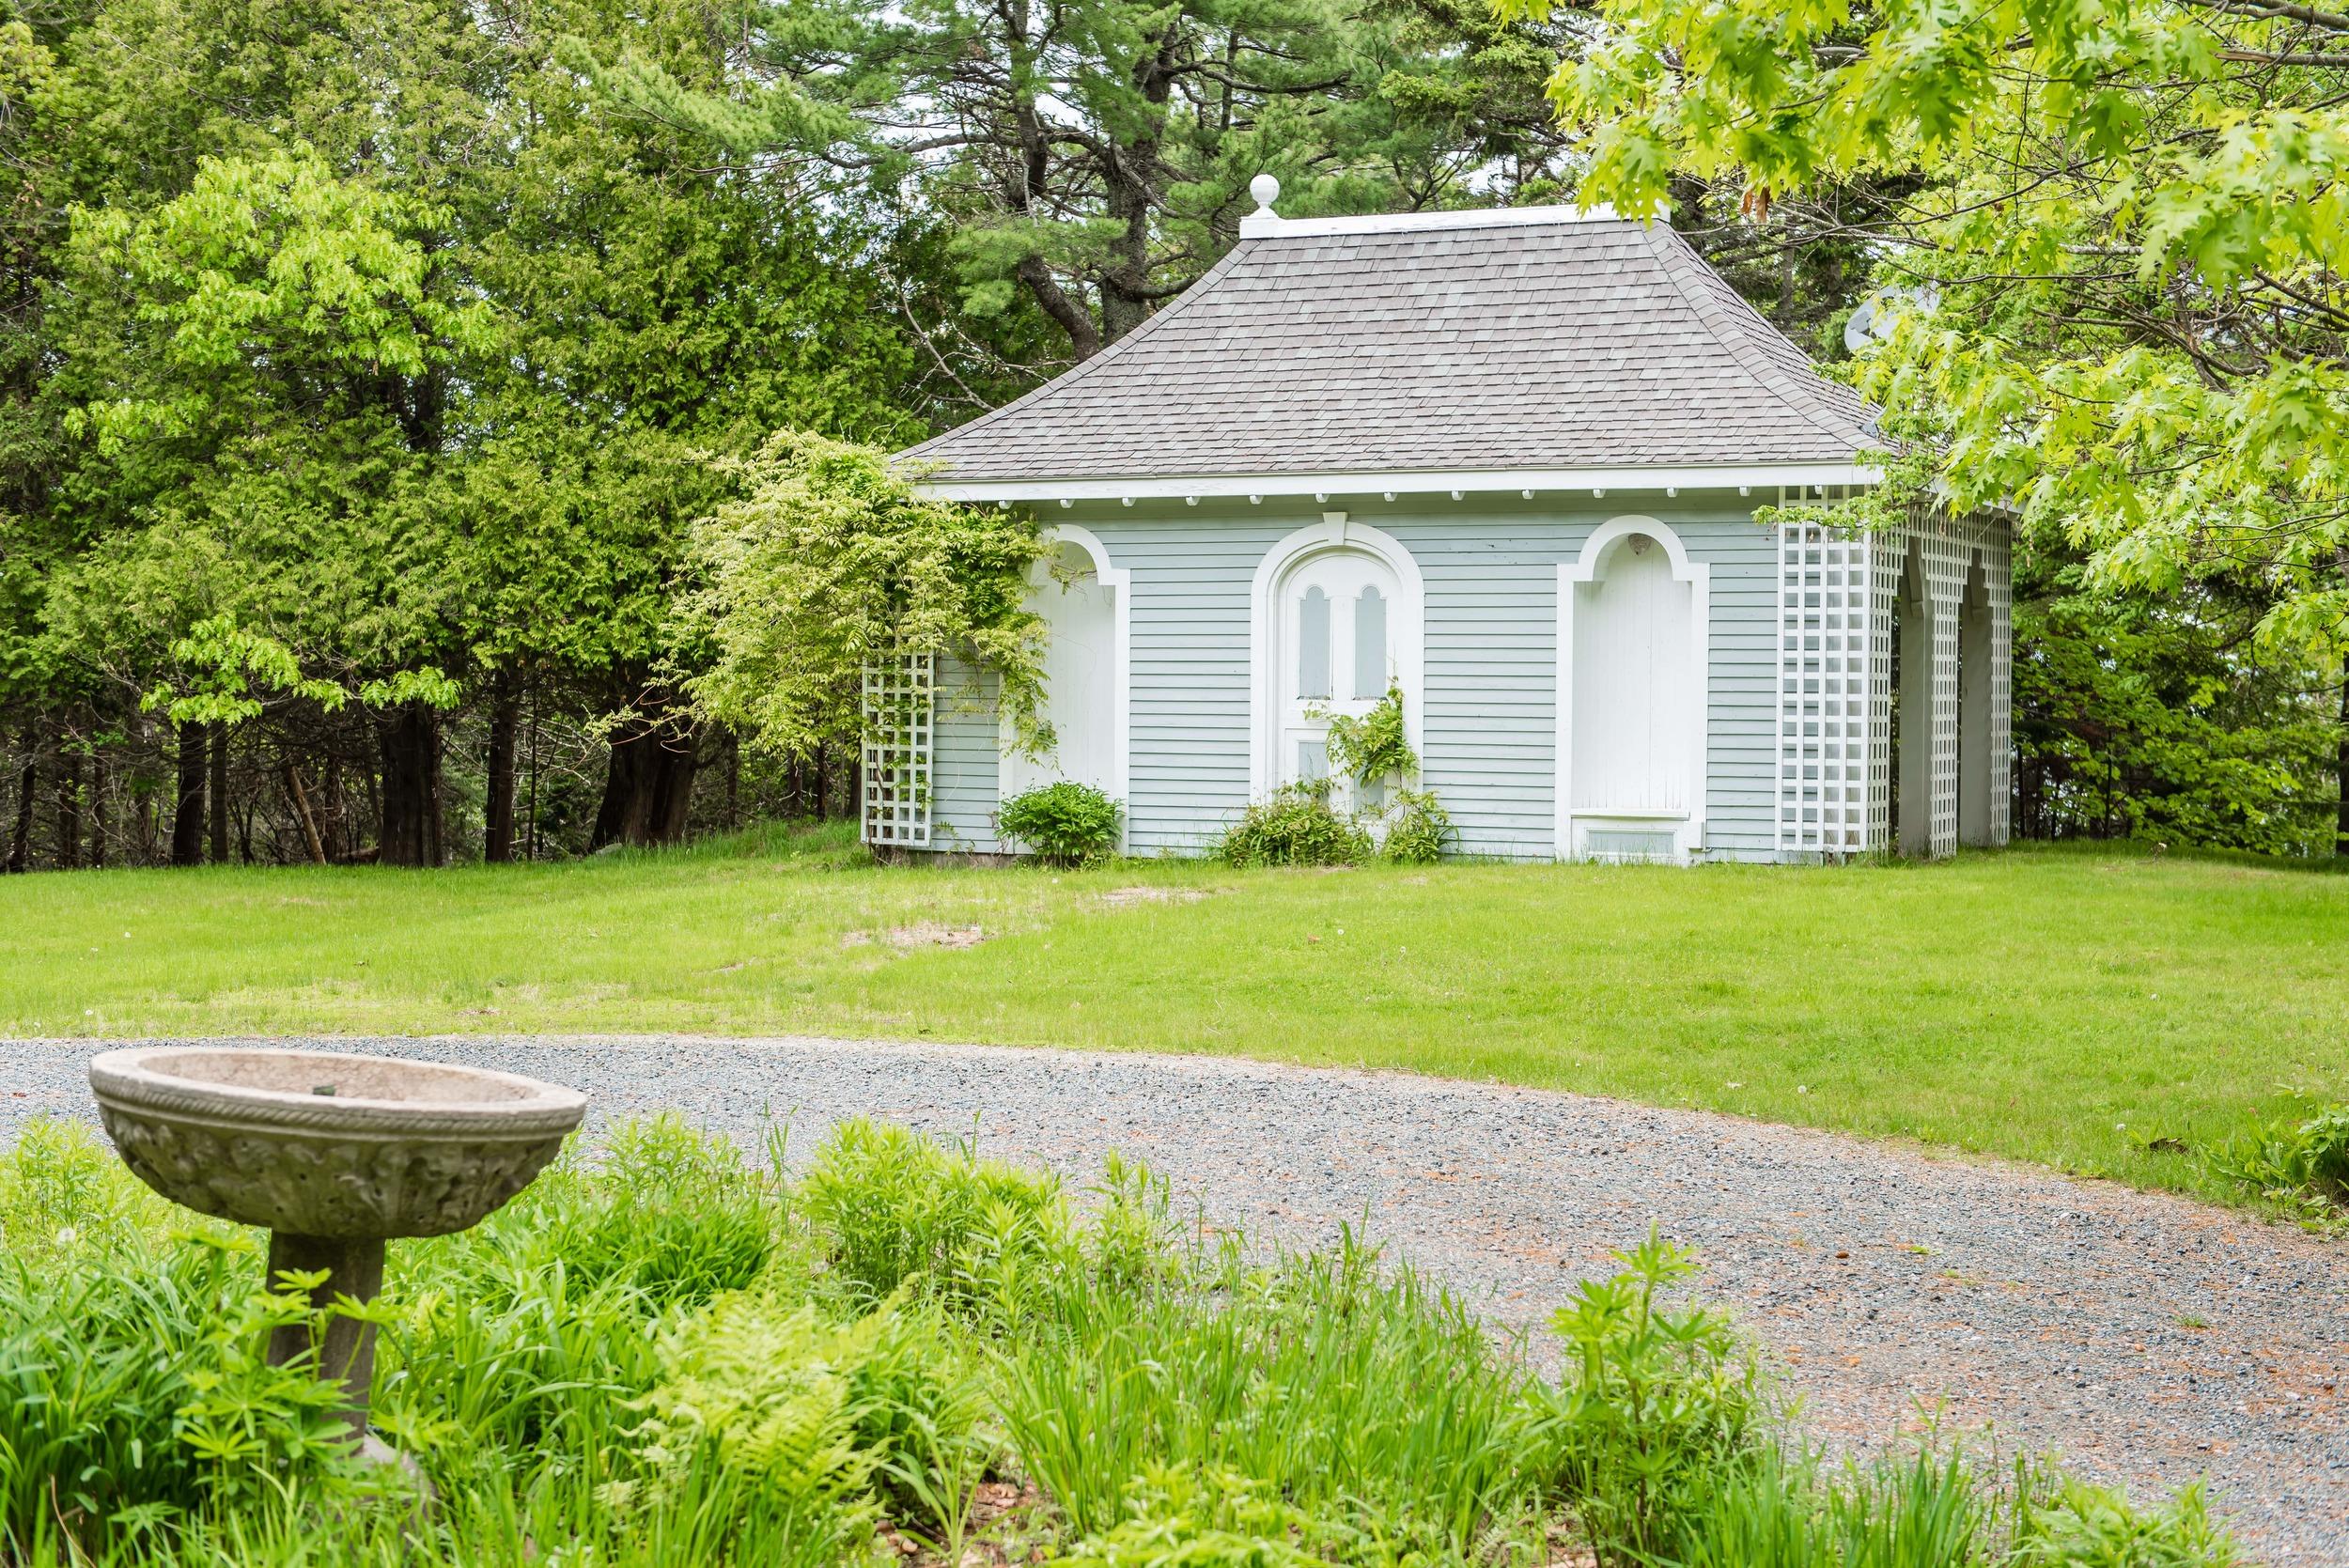 The gazebo where Jen and Adam were married.